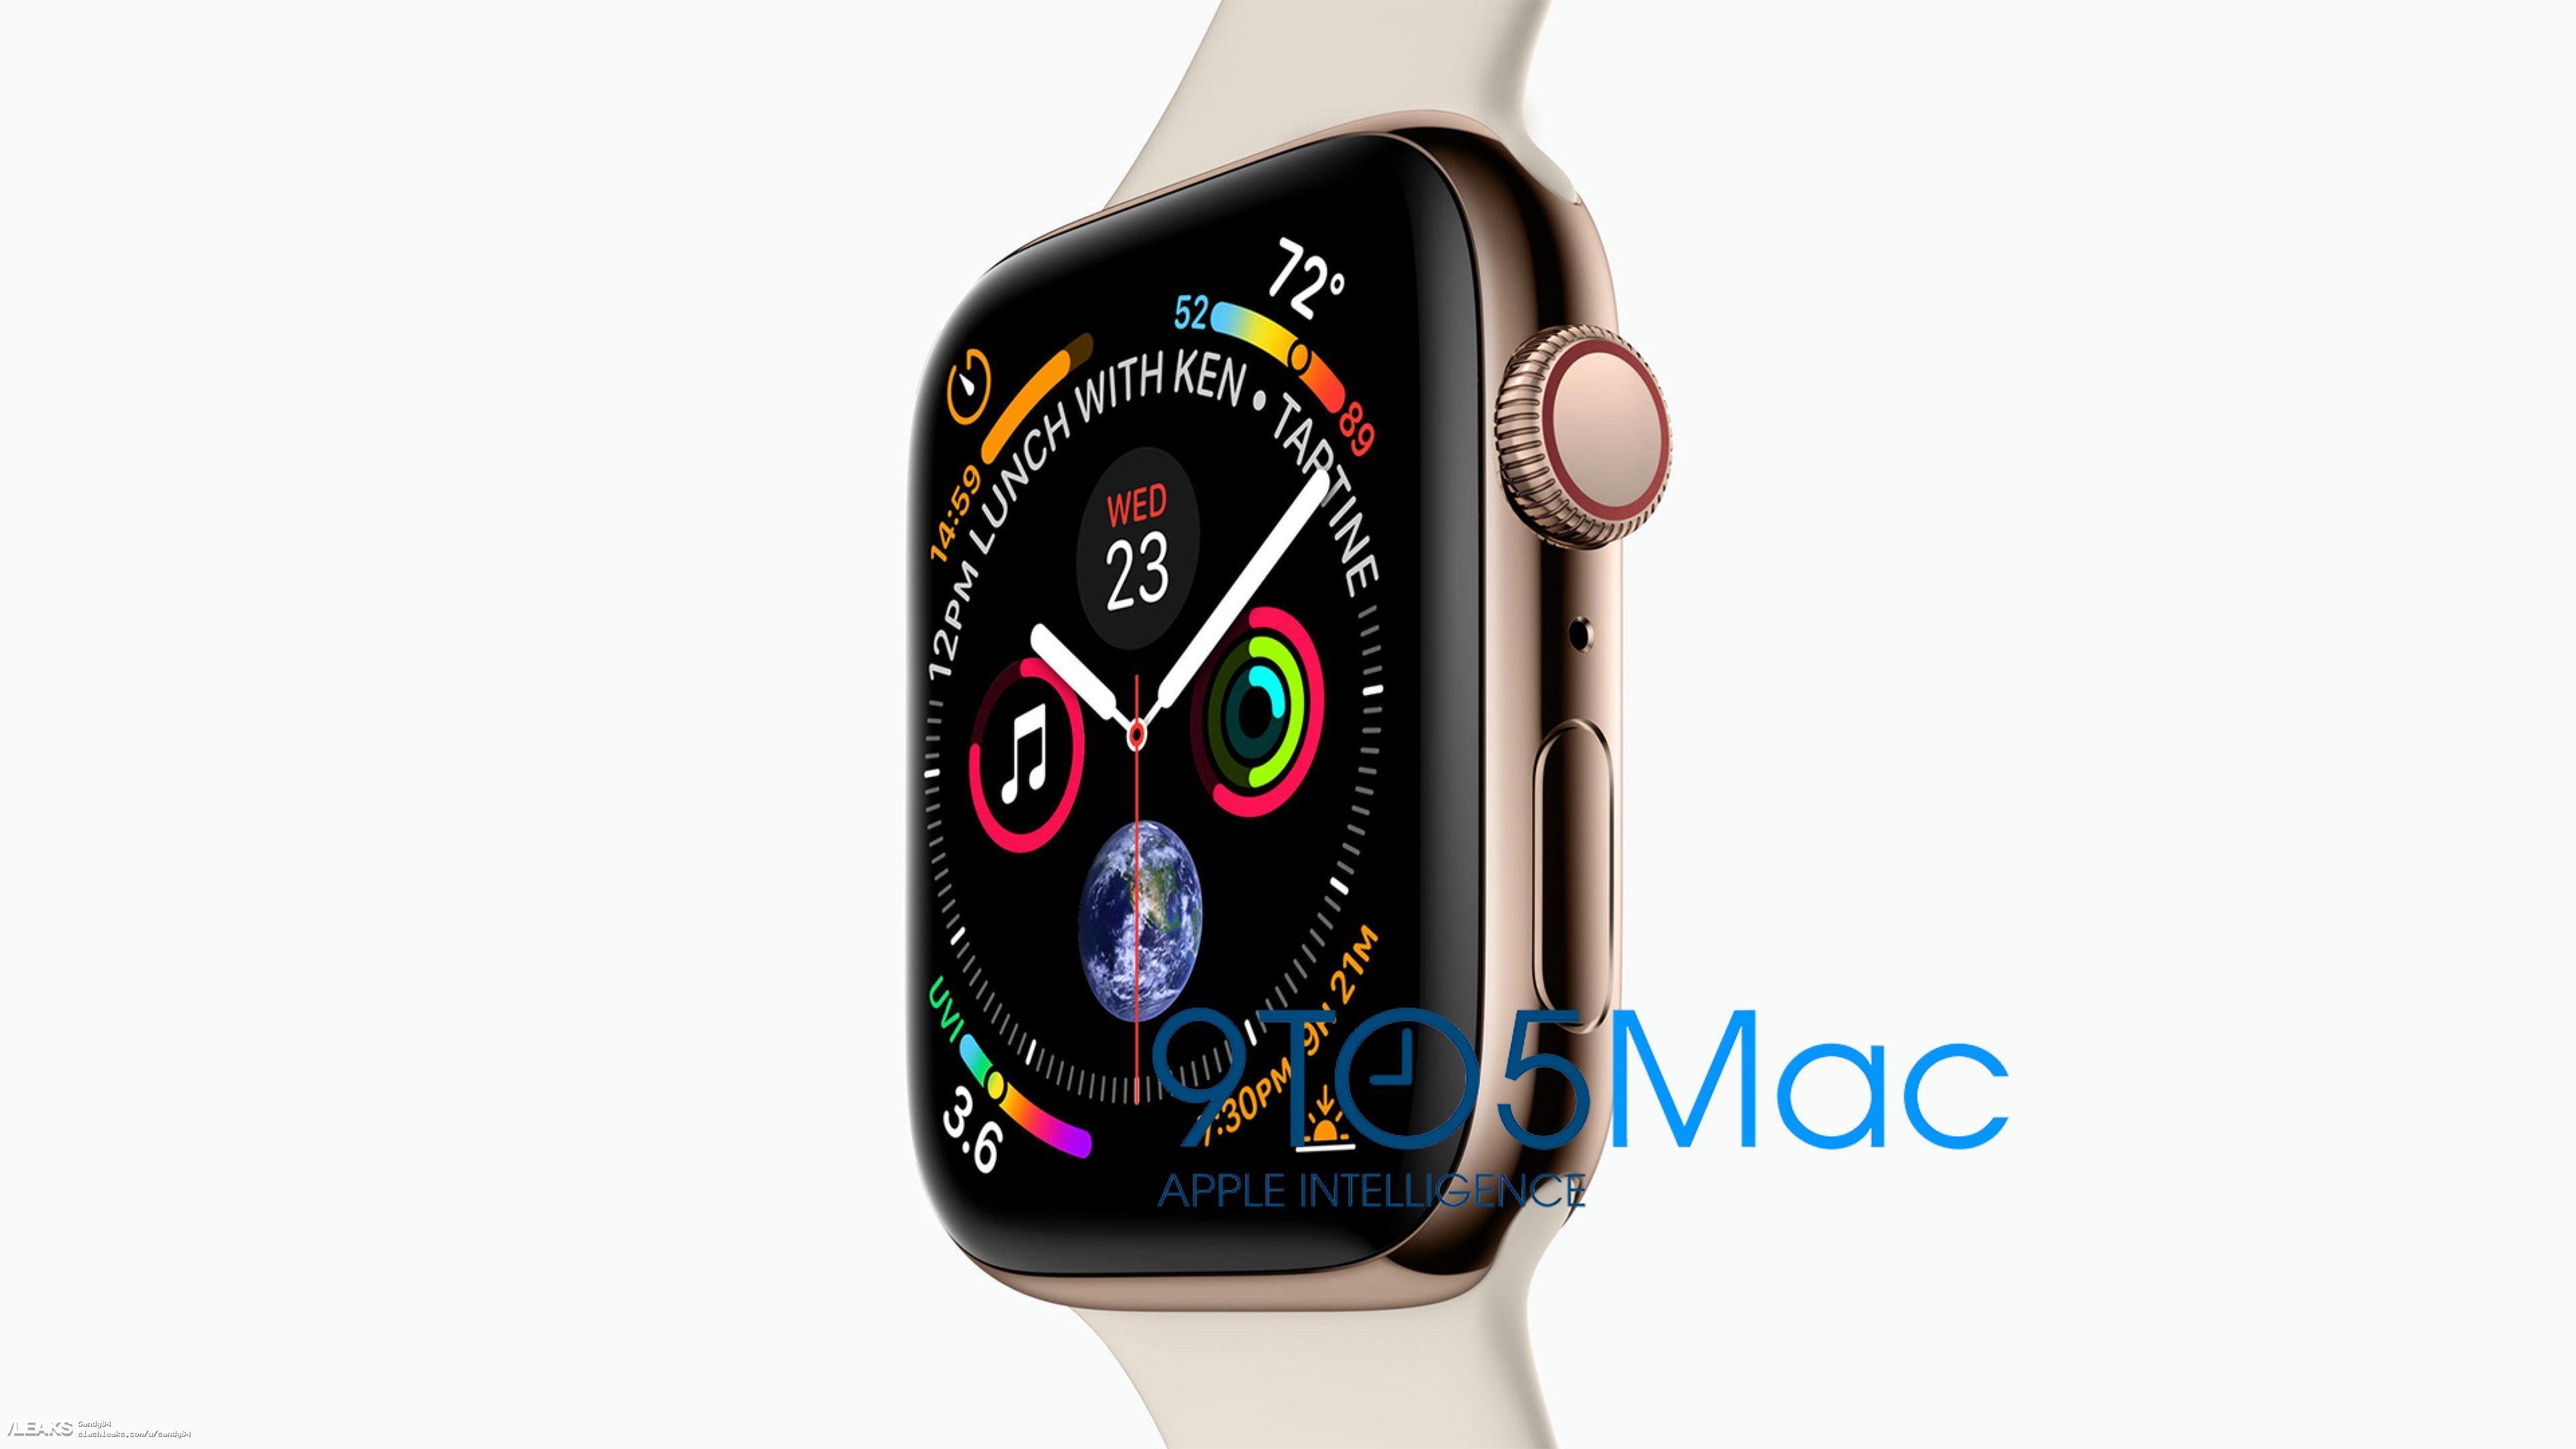 img Apple Watch Series 4 press photo leaked